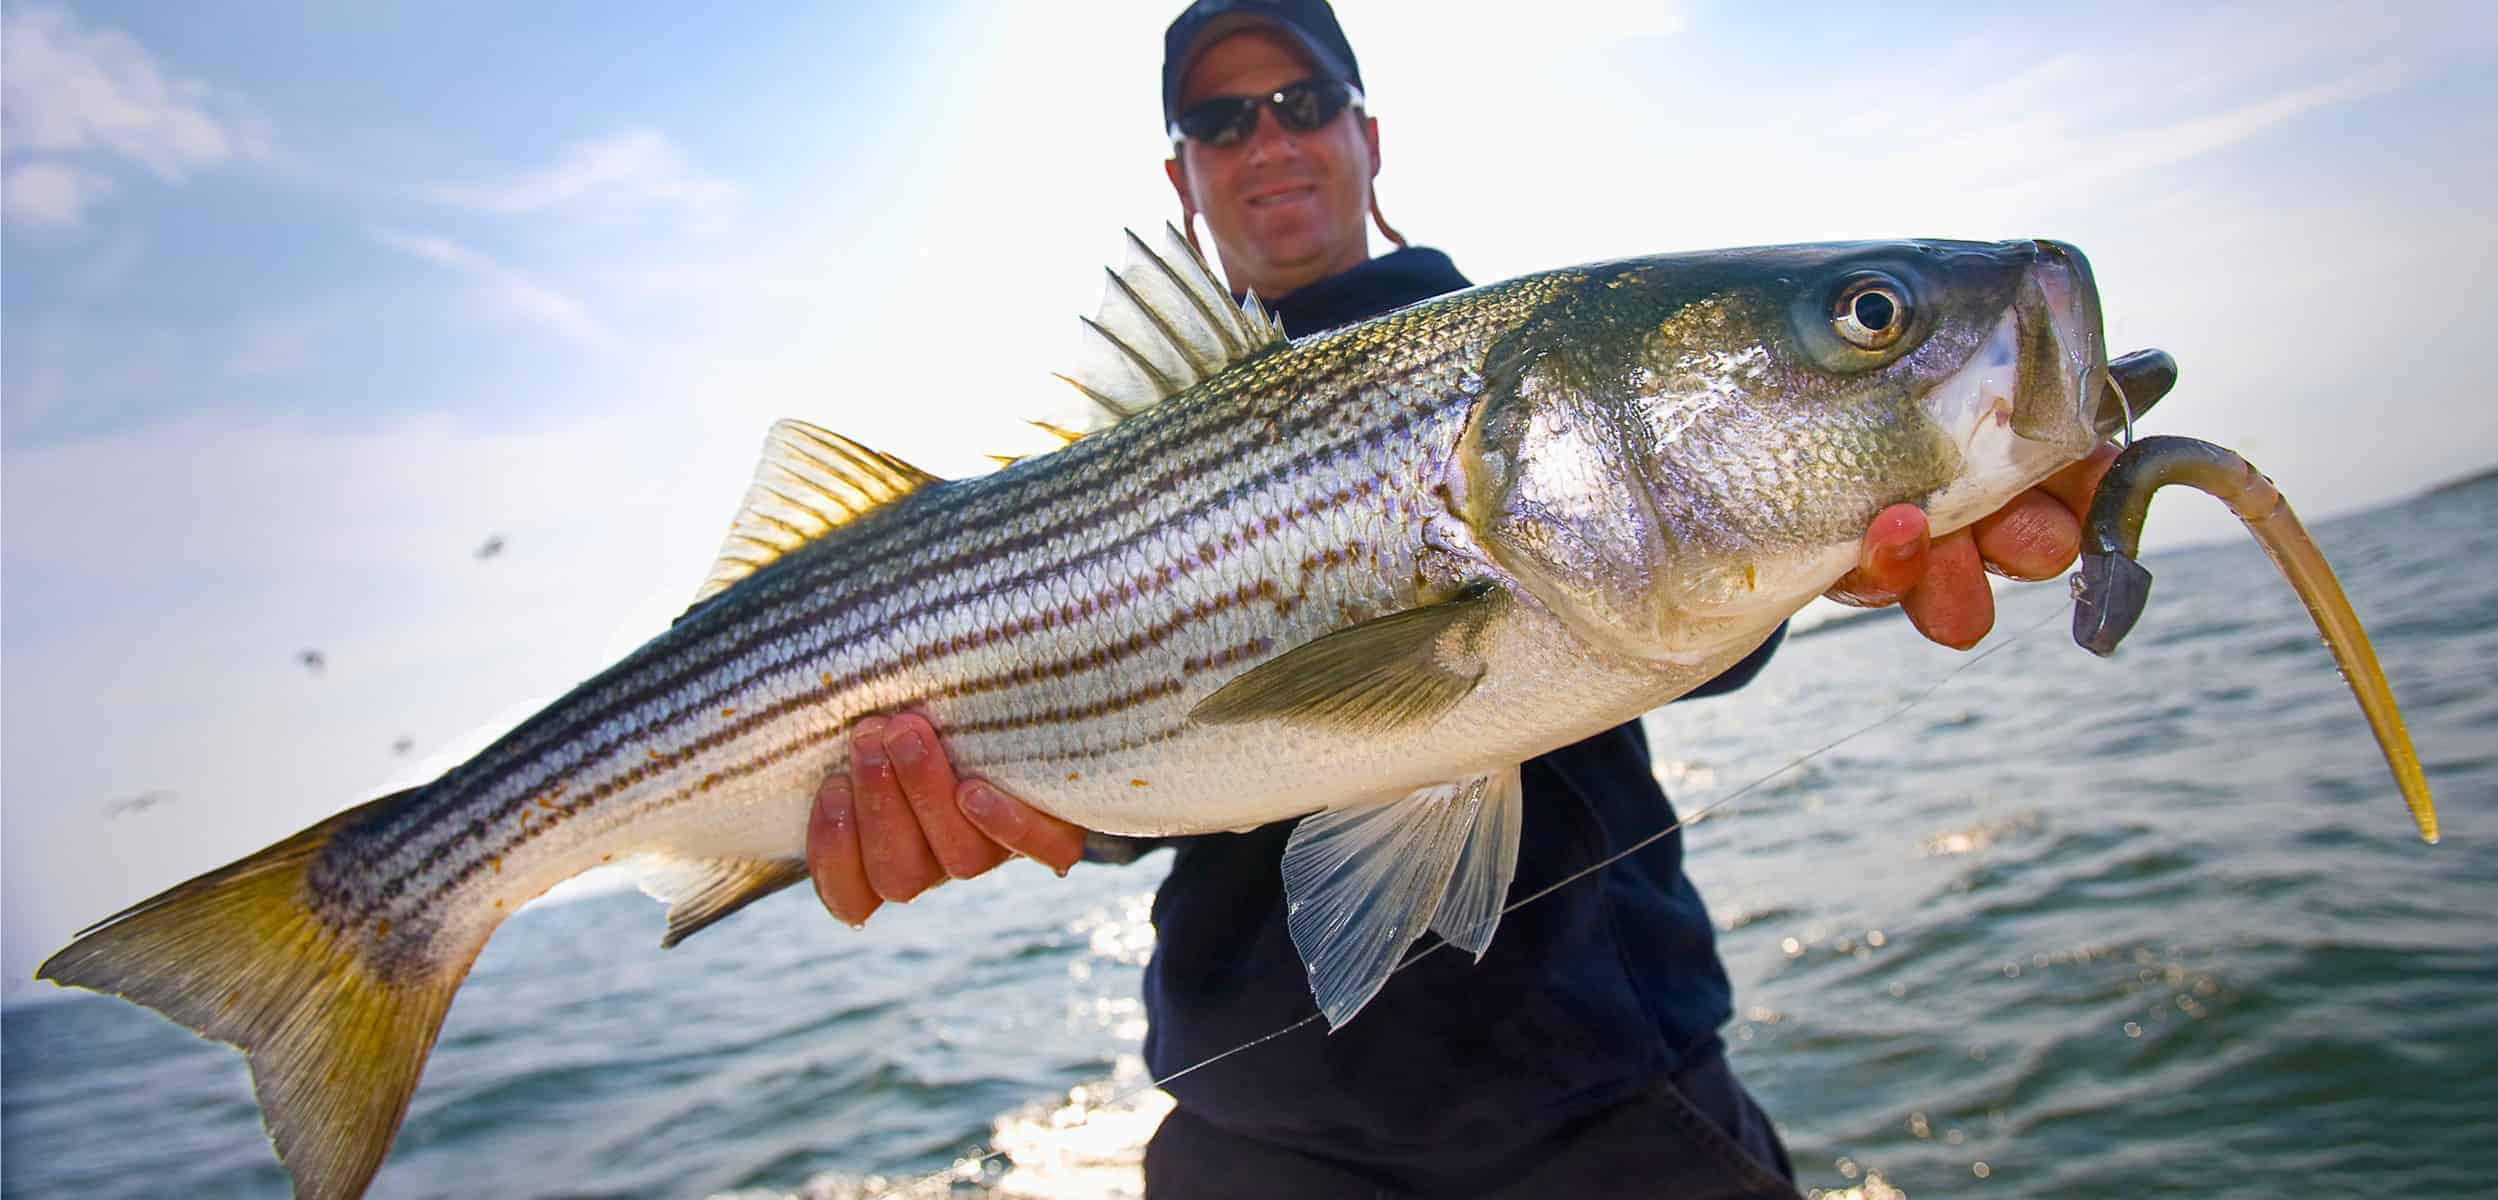 Man Holding Bass Fish